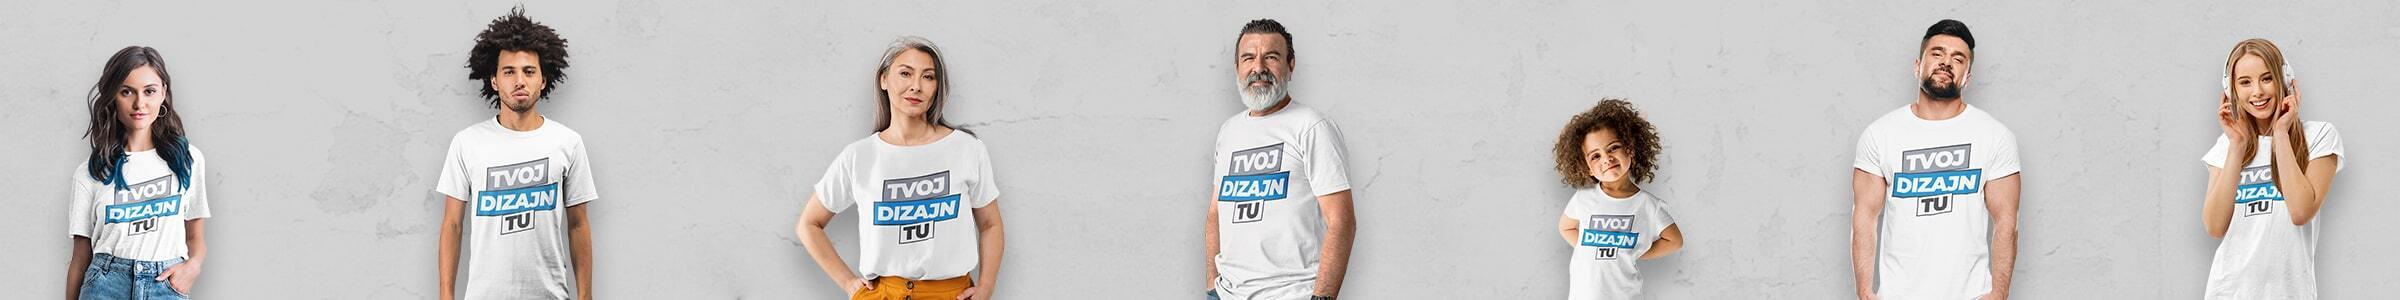 Category_Teaser_Header_T_Shirts_SK_2400x300